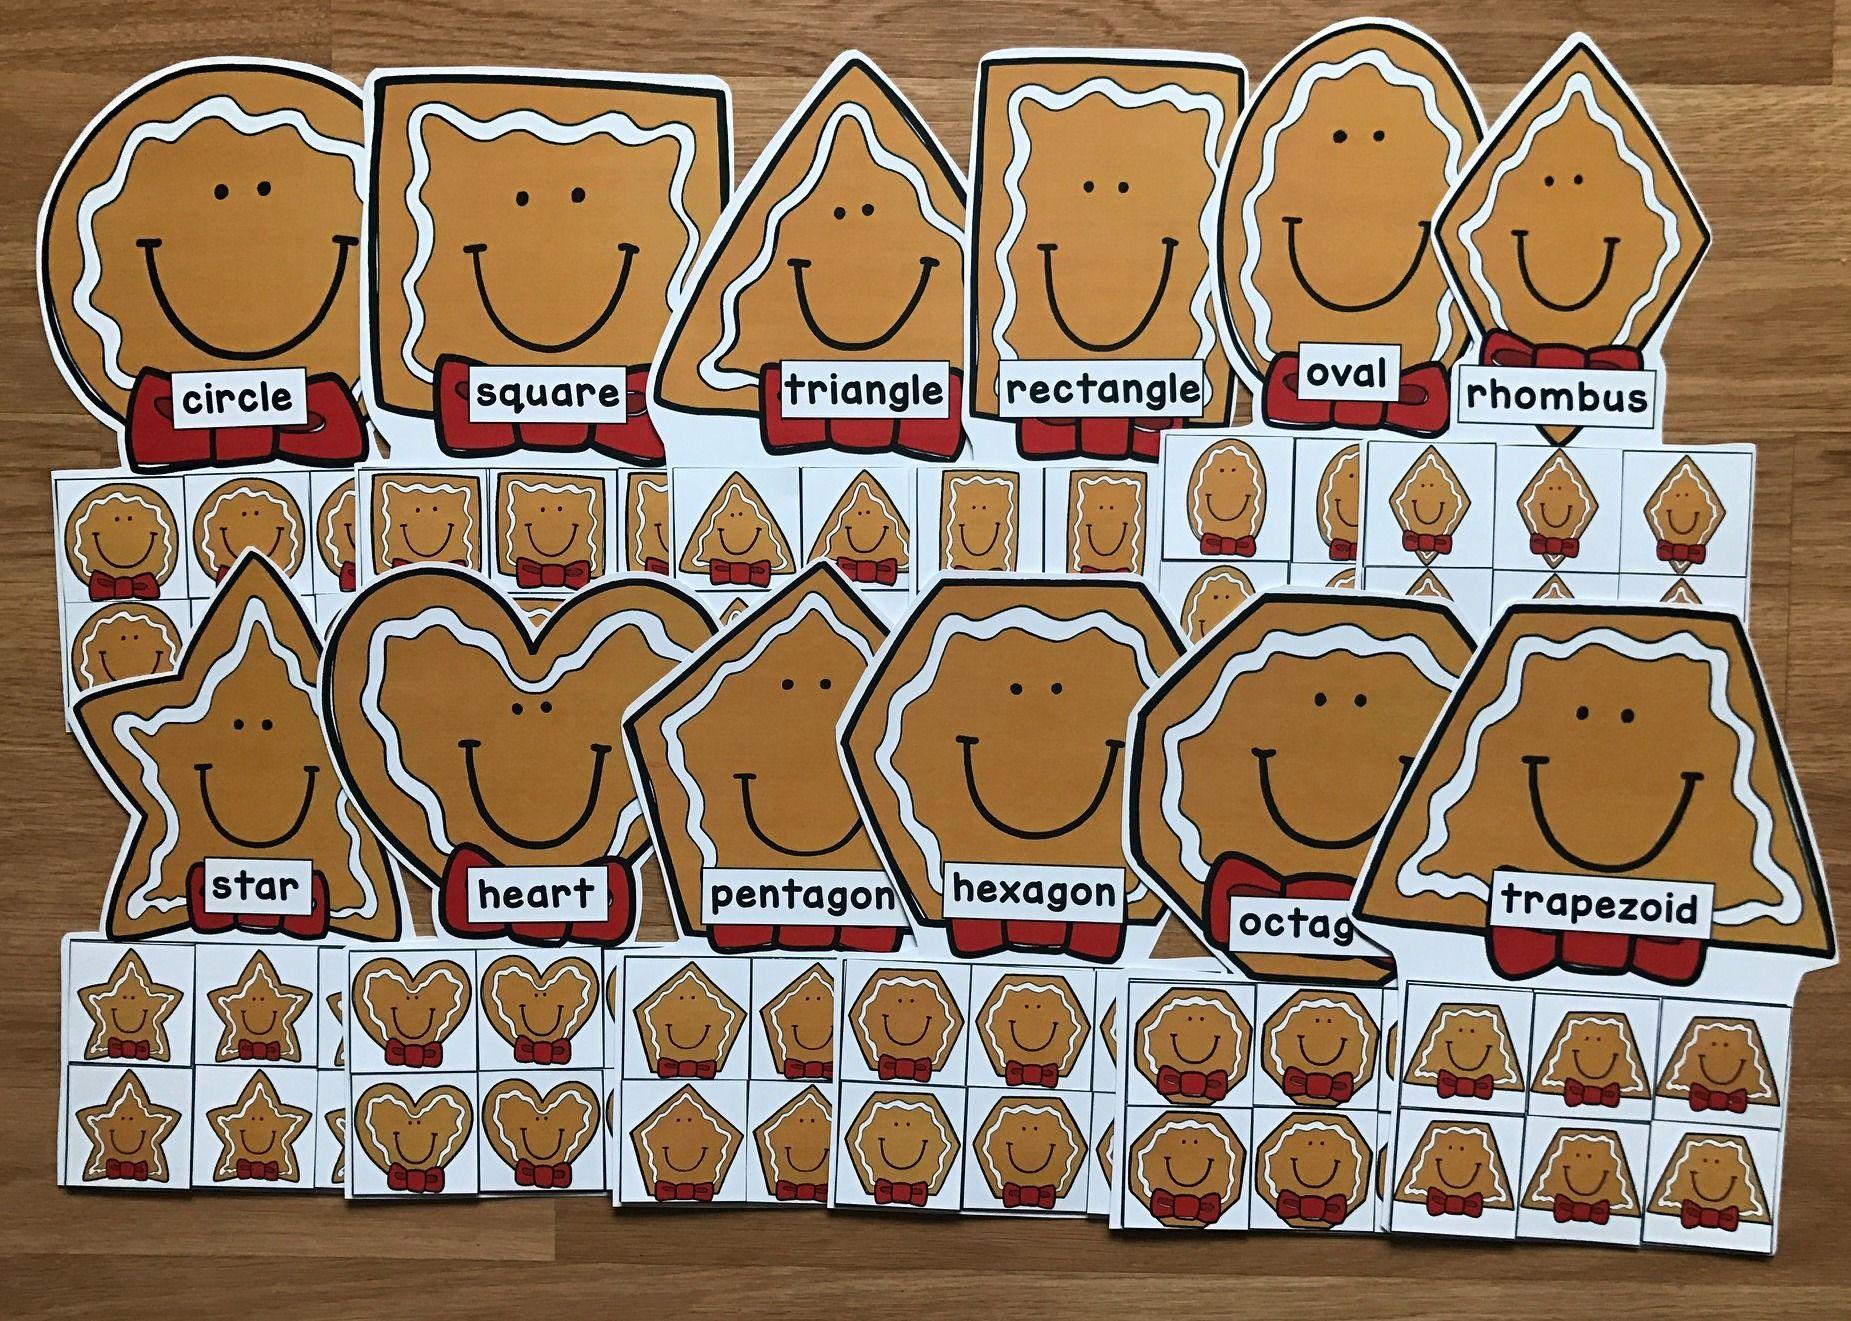 Gingerbread Man Shapes Sorting Mats Gingerbread Man Activities Gingerbread Man Coloring Page Gingerbread Activities [ 1321 x 1851 Pixel ]